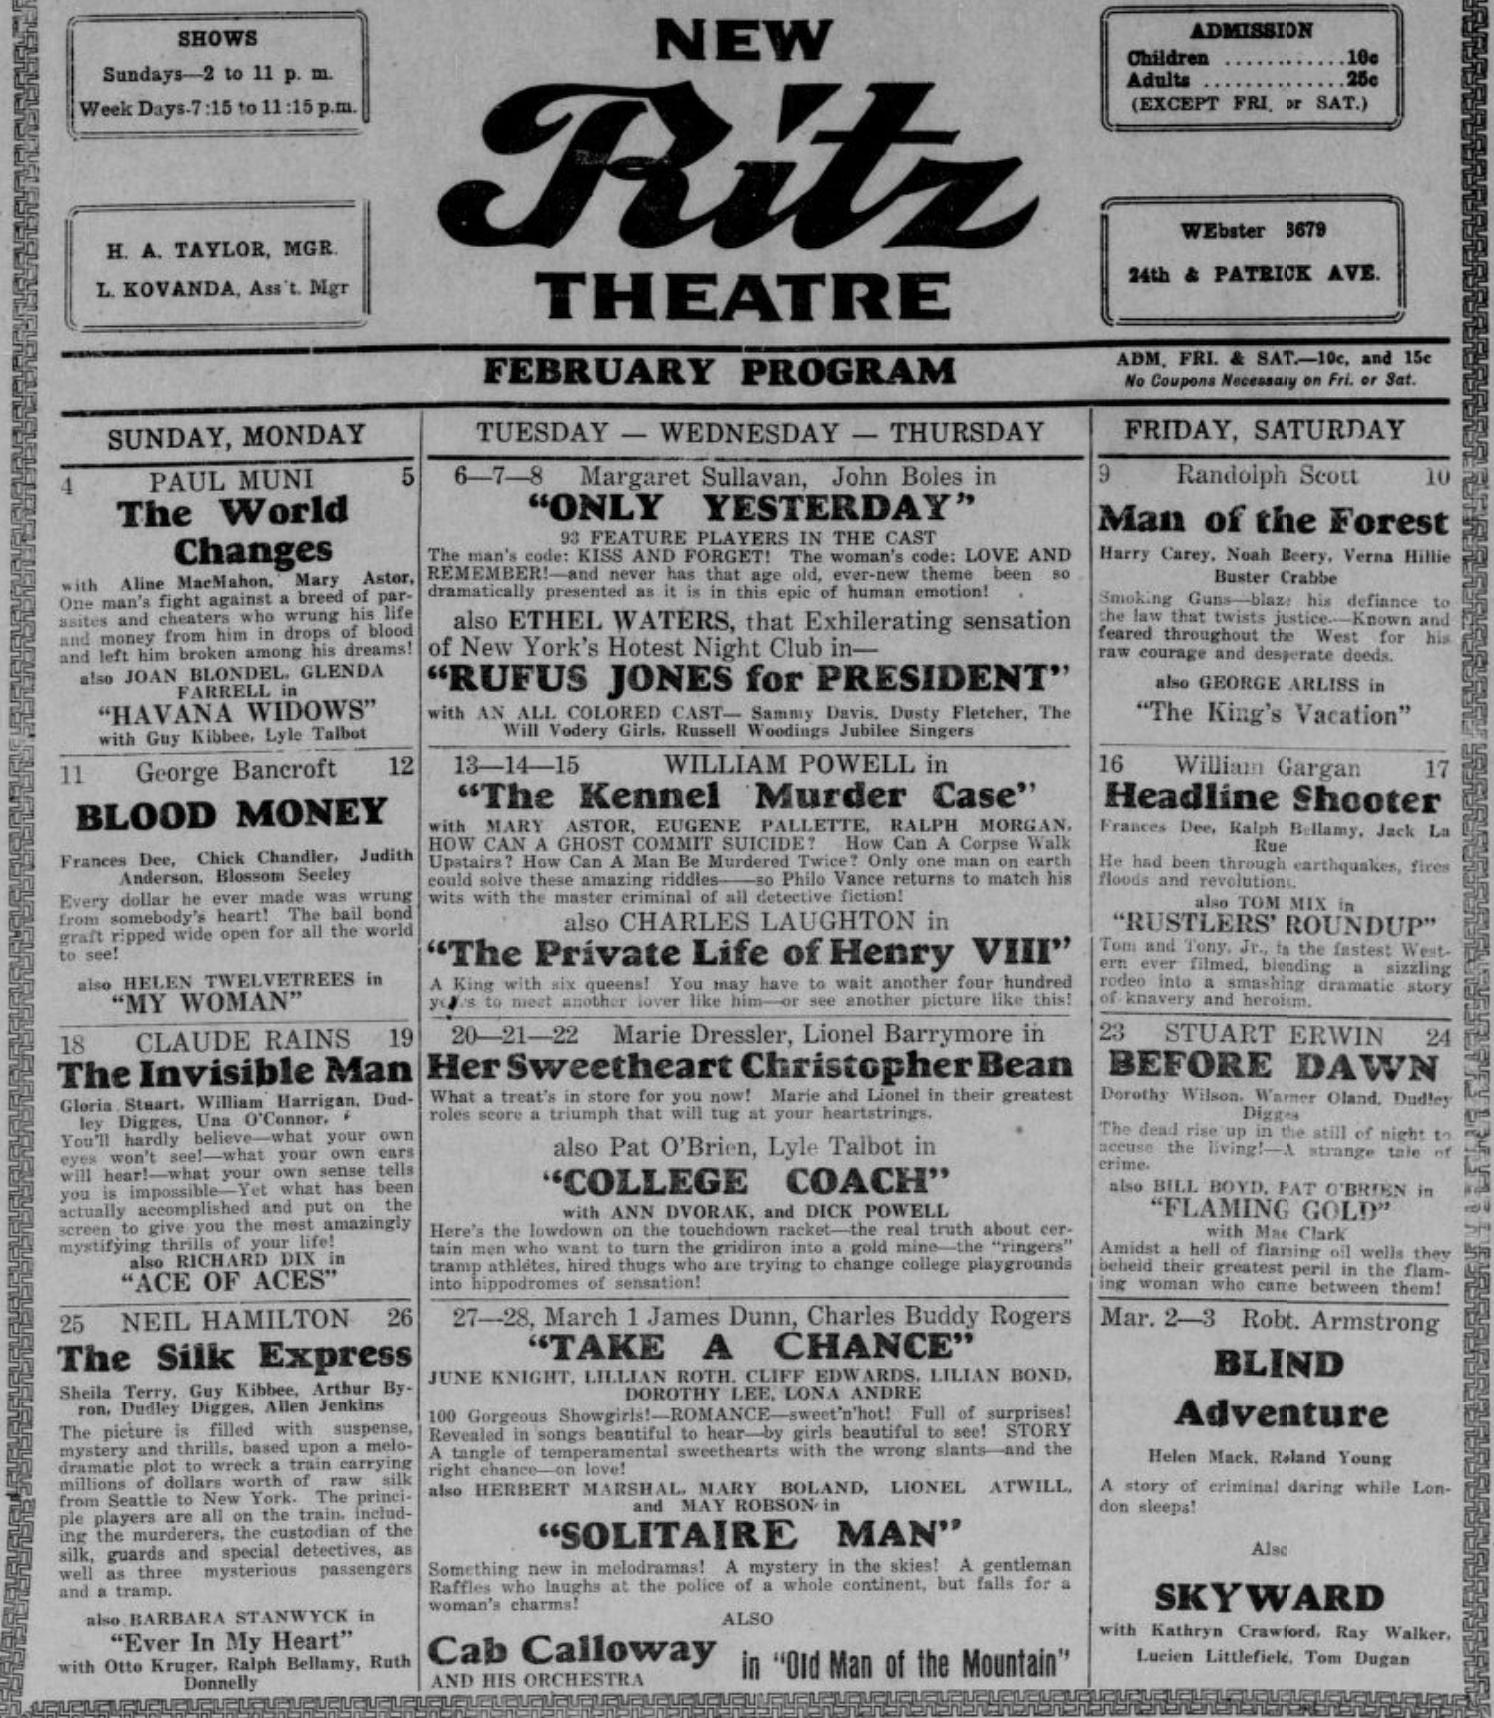 Ritz Theatre at N. 24th and Patrick Streets, North Omaha, Nebraska.